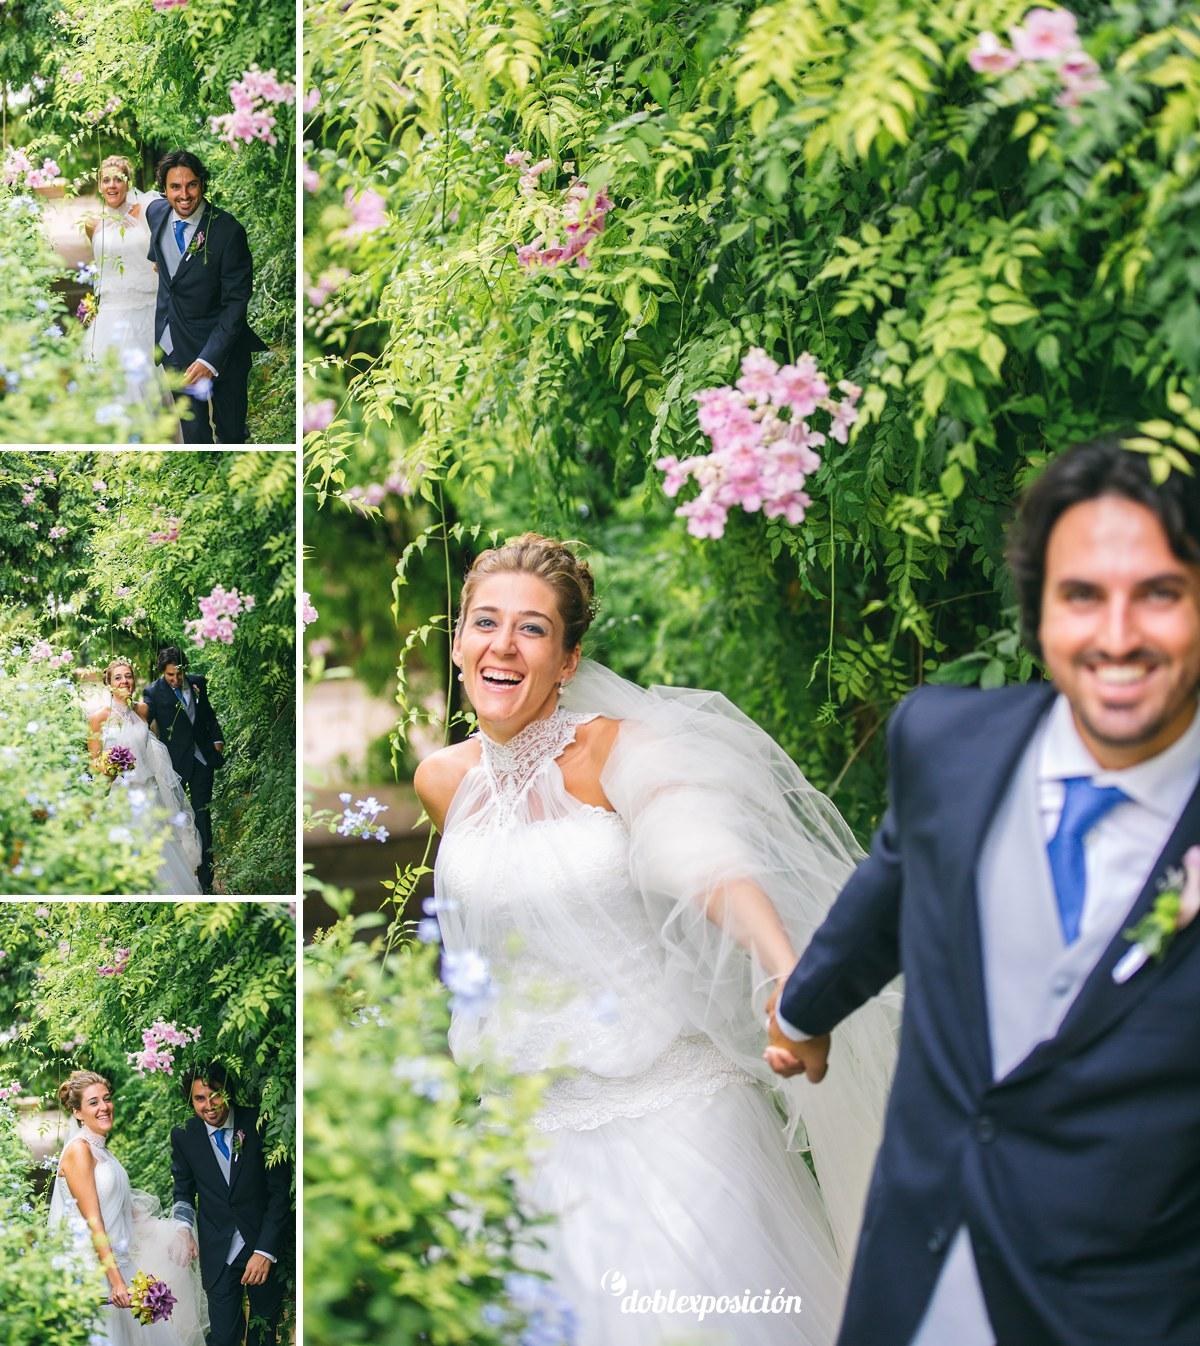 fotografos-boda-finca-jardines-de-abril-alicante_0029